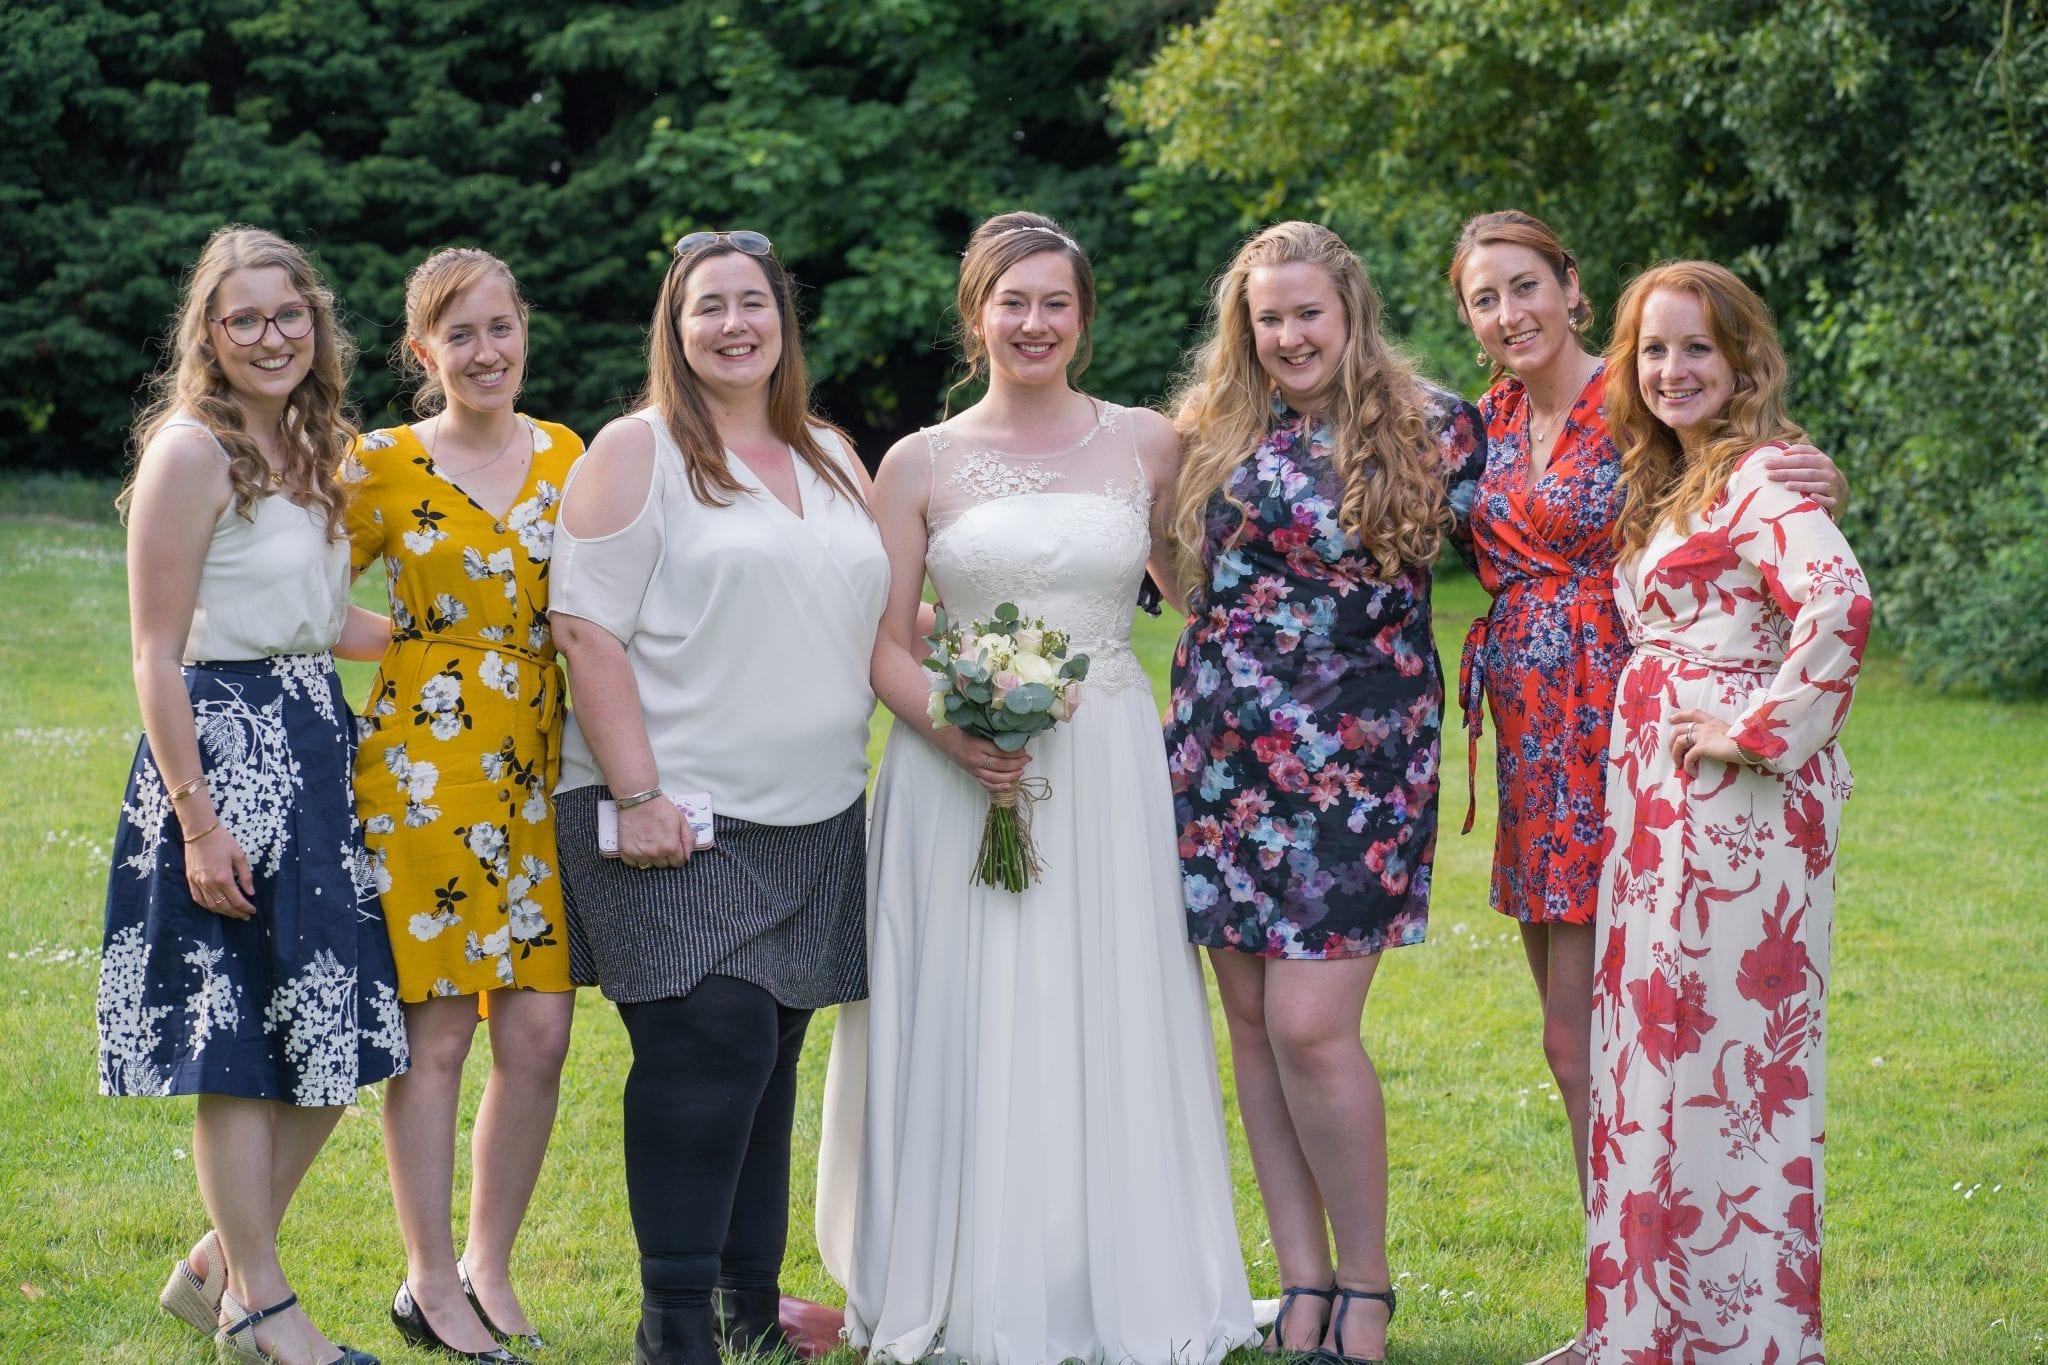 Wedding Photography - Group Portrait